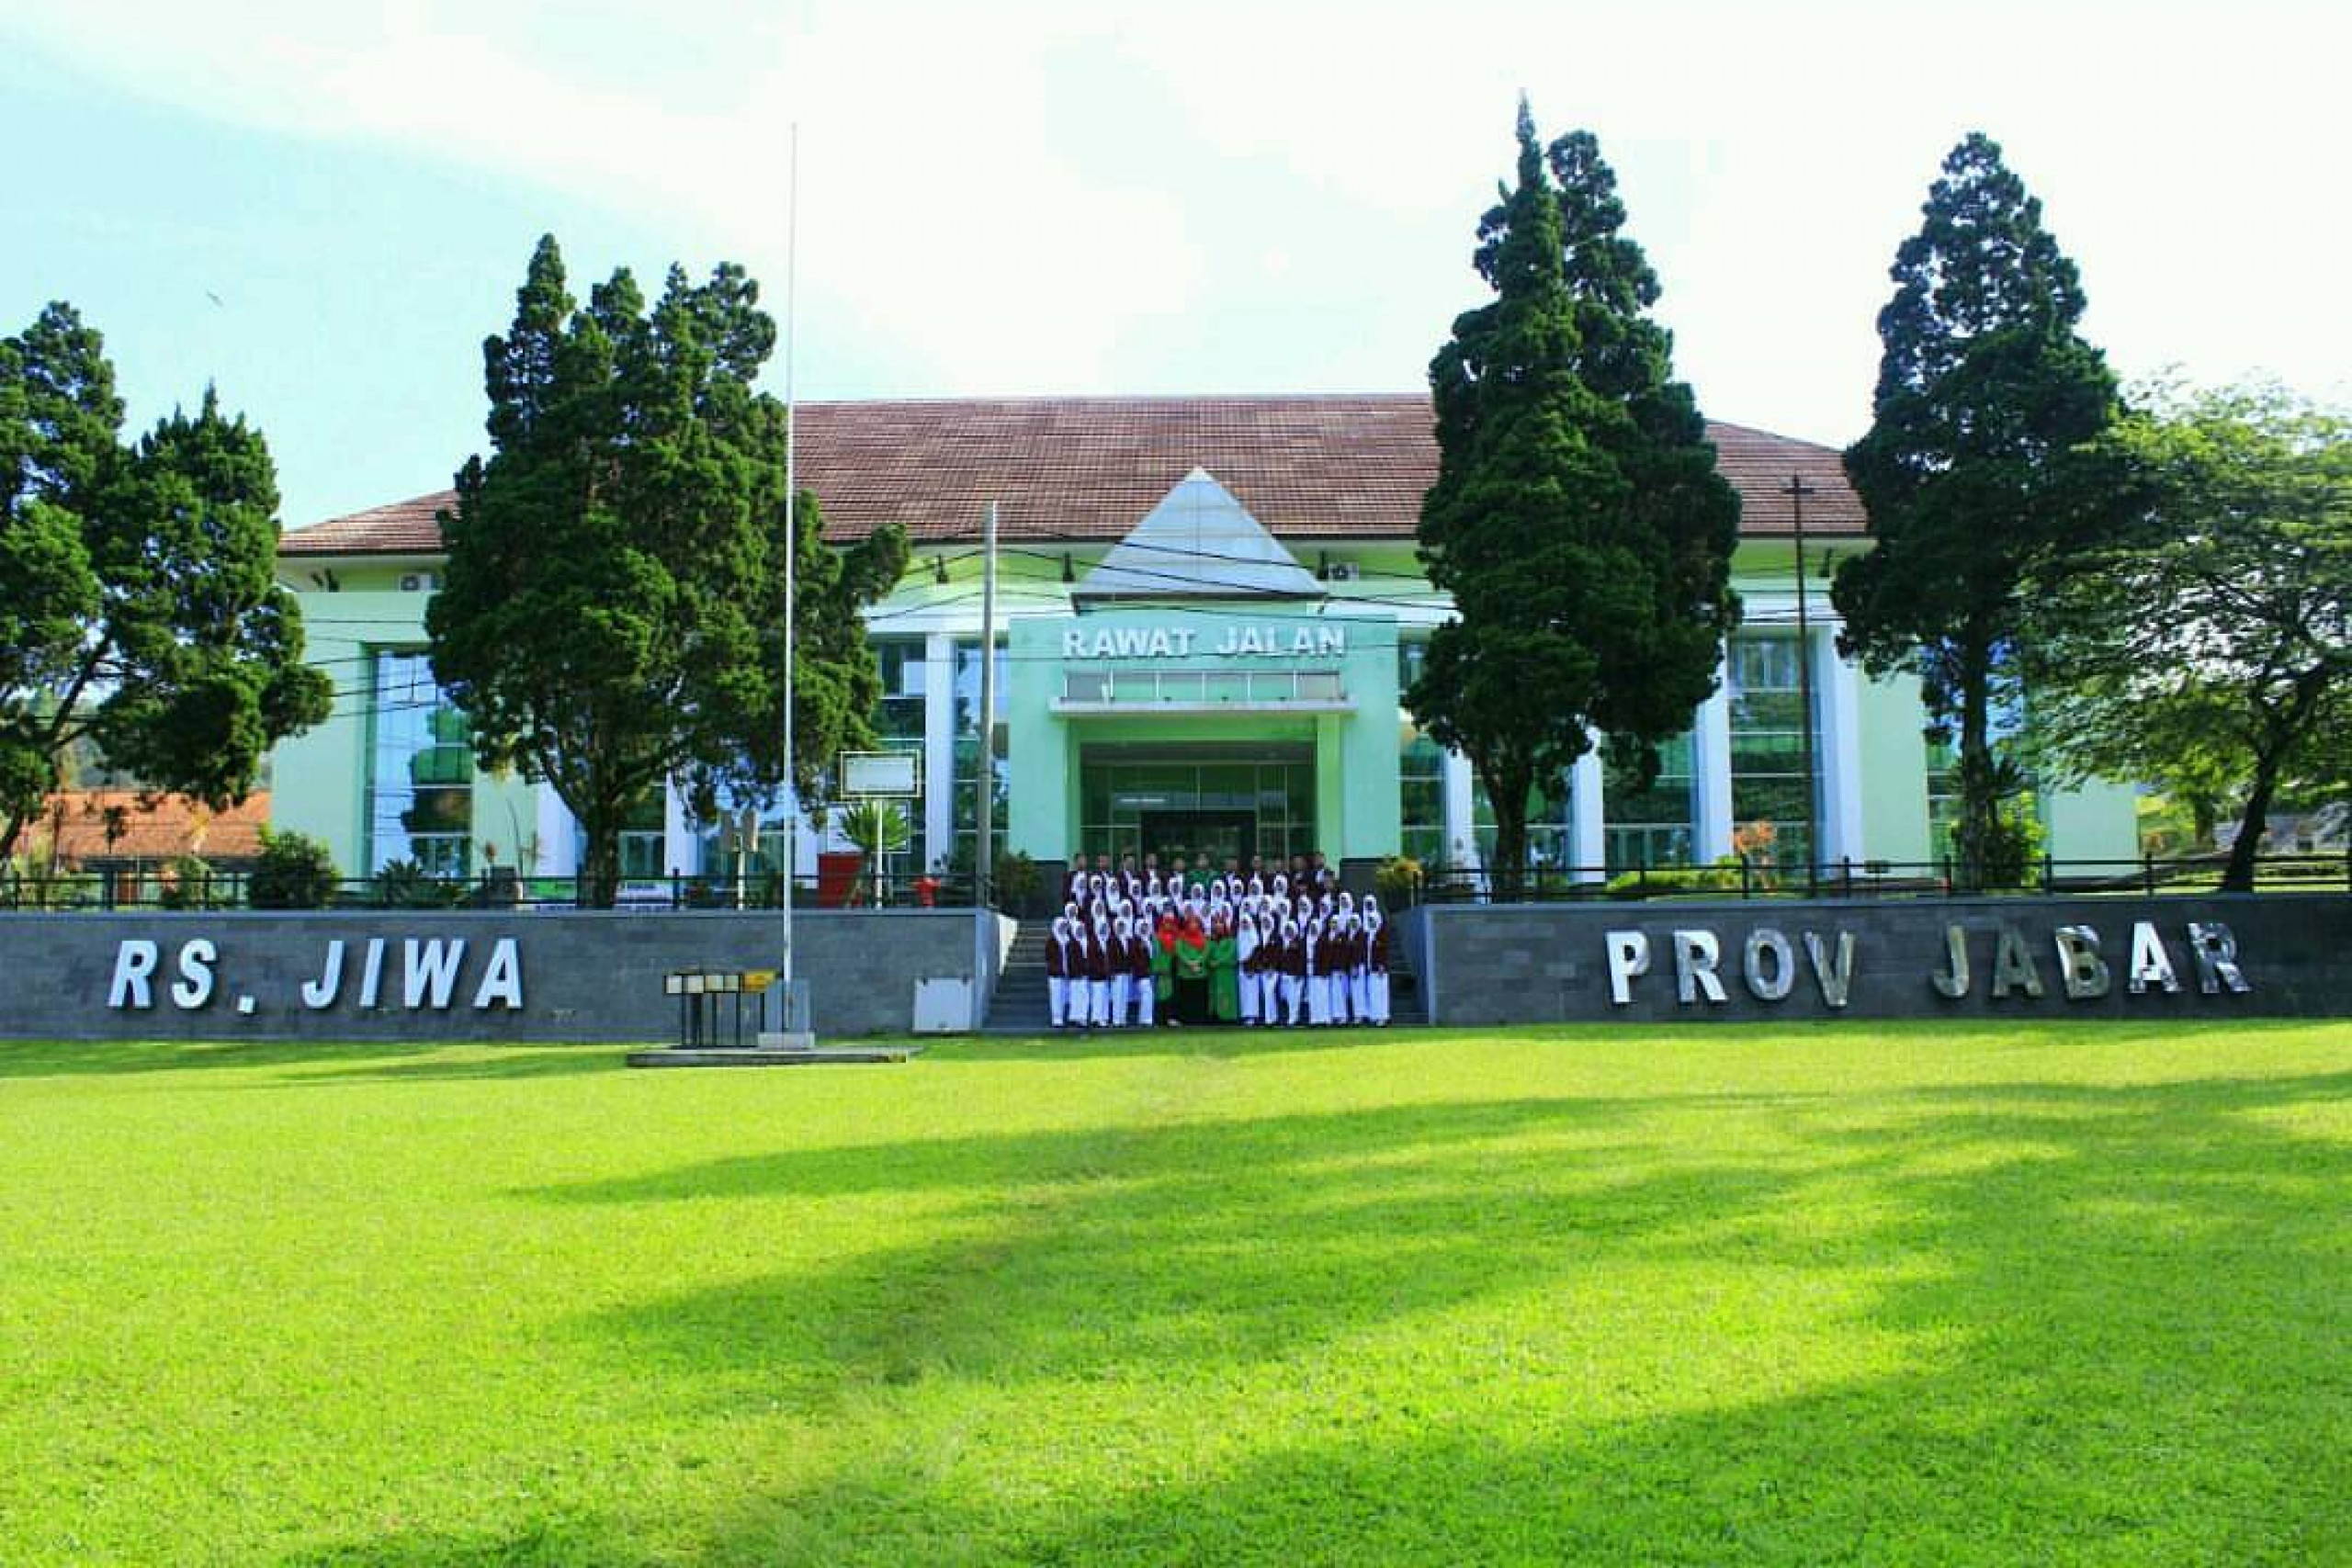 KPBU Jabar - Pengembangan Rumah Sakit - Rumah Sakit Jiwa Cisarua, Kab. Bandung Barat